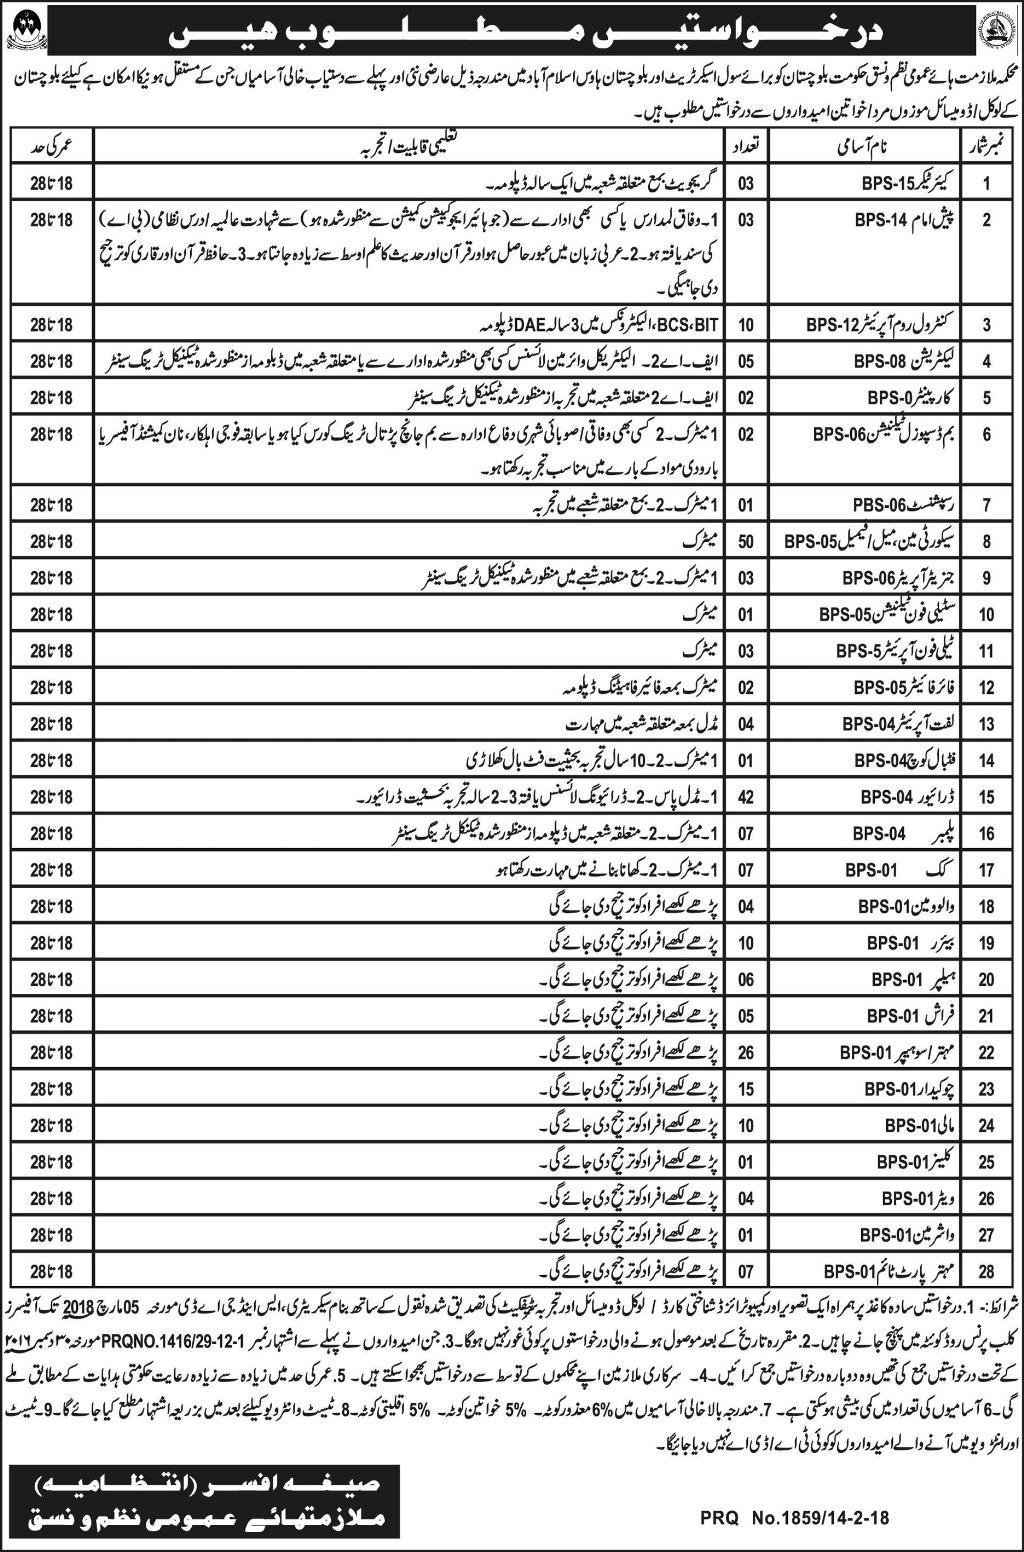 Civil Secretariat Baluchistan 235 Jobs, 15th February 2018 Daily Express Newspaper.